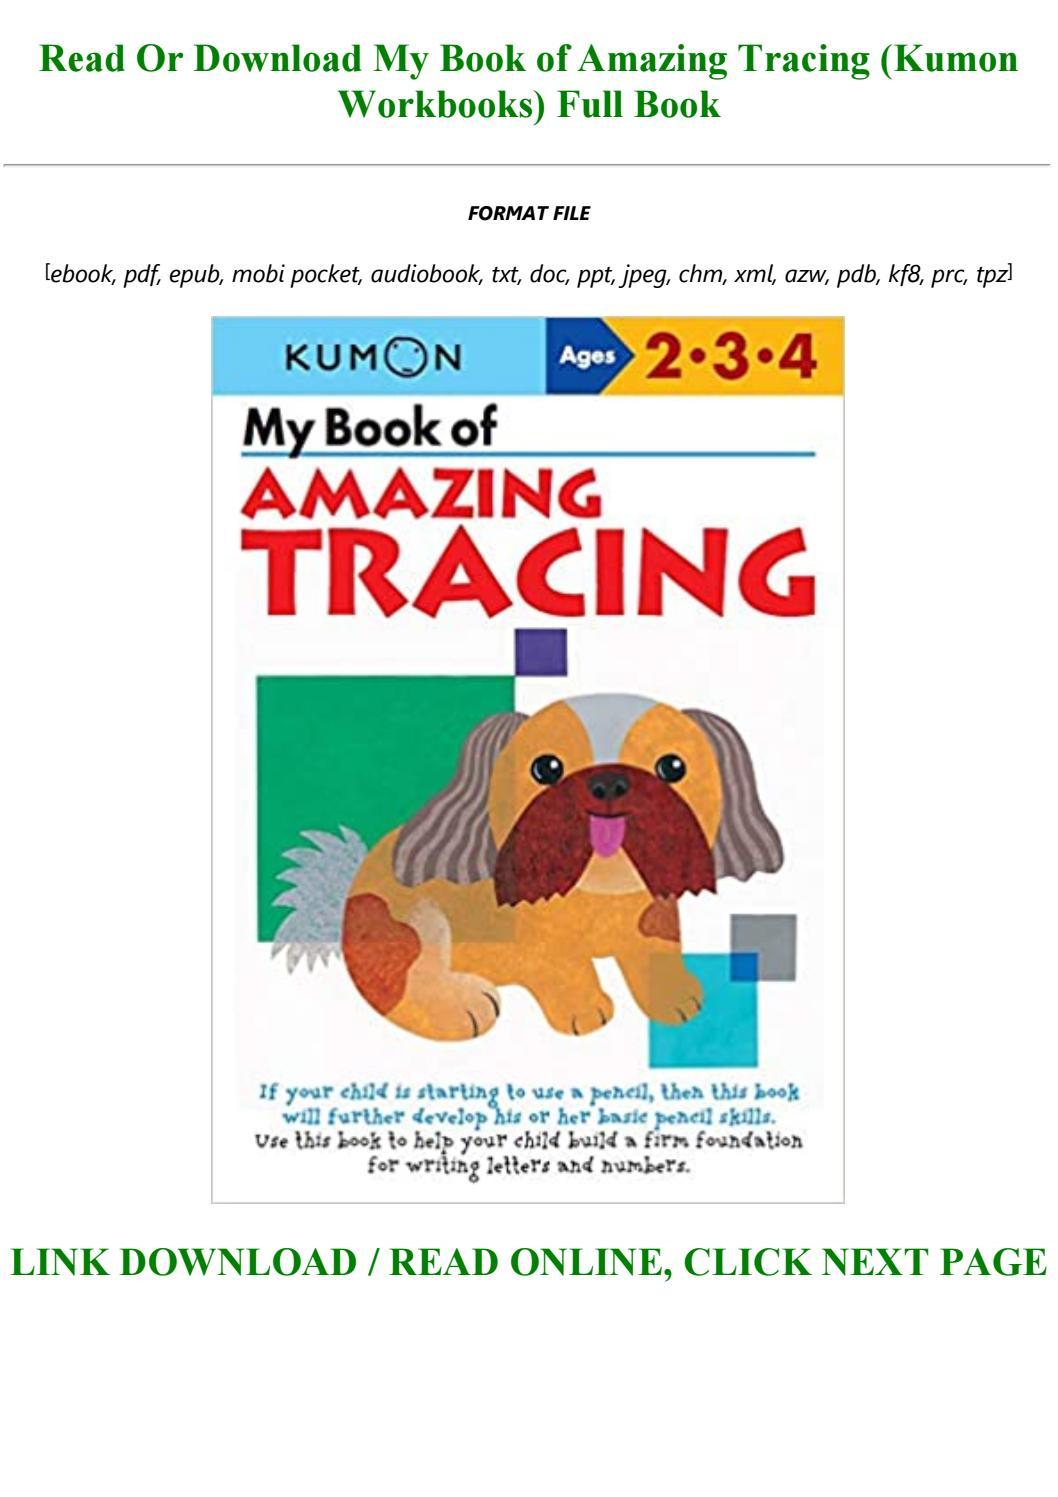 My Book Of Amazing Tracing (Kumon Workbooks)